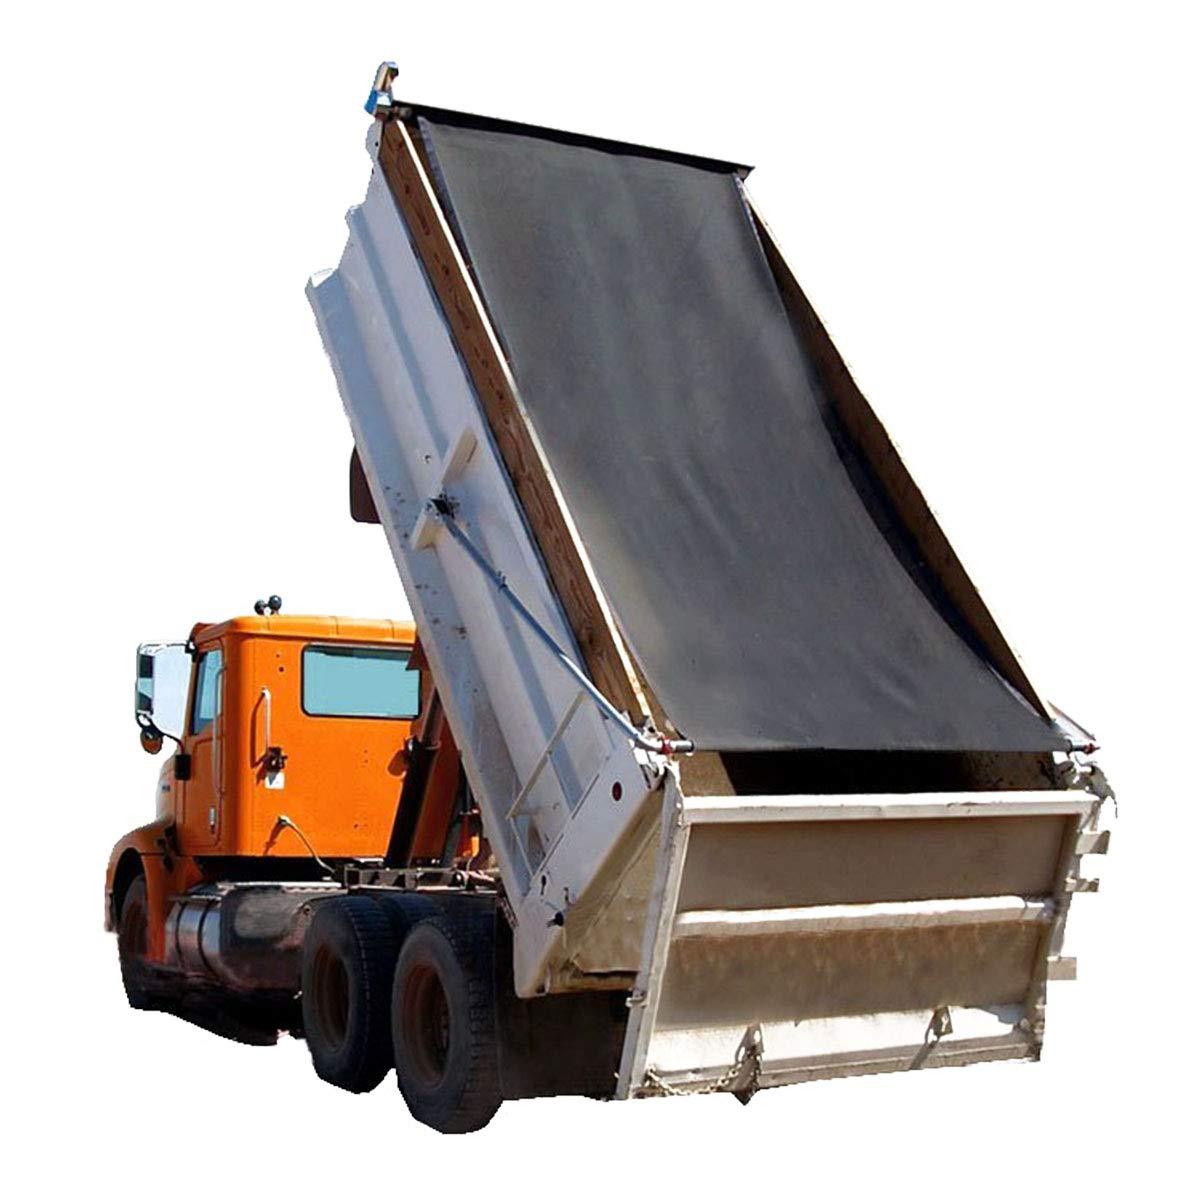 Dump Truck Mesh Tarp 8'X14' - Black Tentproinc Heavy Duty Cover with 6'' Pocket Reinforced Double Needle Stitch Webbing Ripping Tearing Stop, No Rust Thicker Brass Grommets –3 Years Limited Warranty